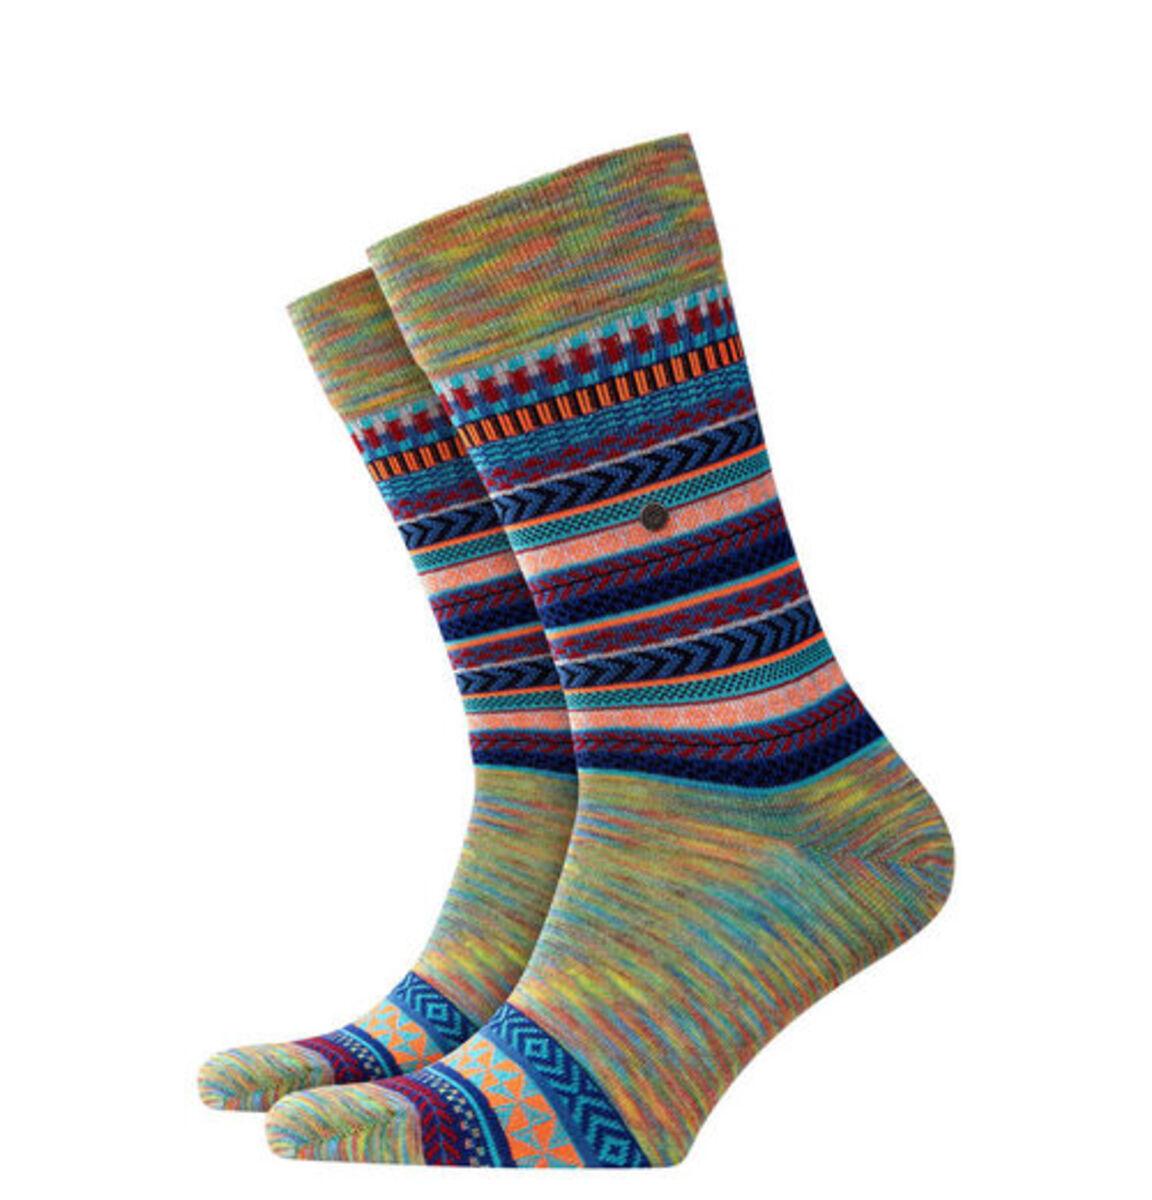 "Bild 2 von Burlington Socken ""The X-Fair Isle"", Multicolor-Garn, Schurwolle, 6576 lupin, 40-46"